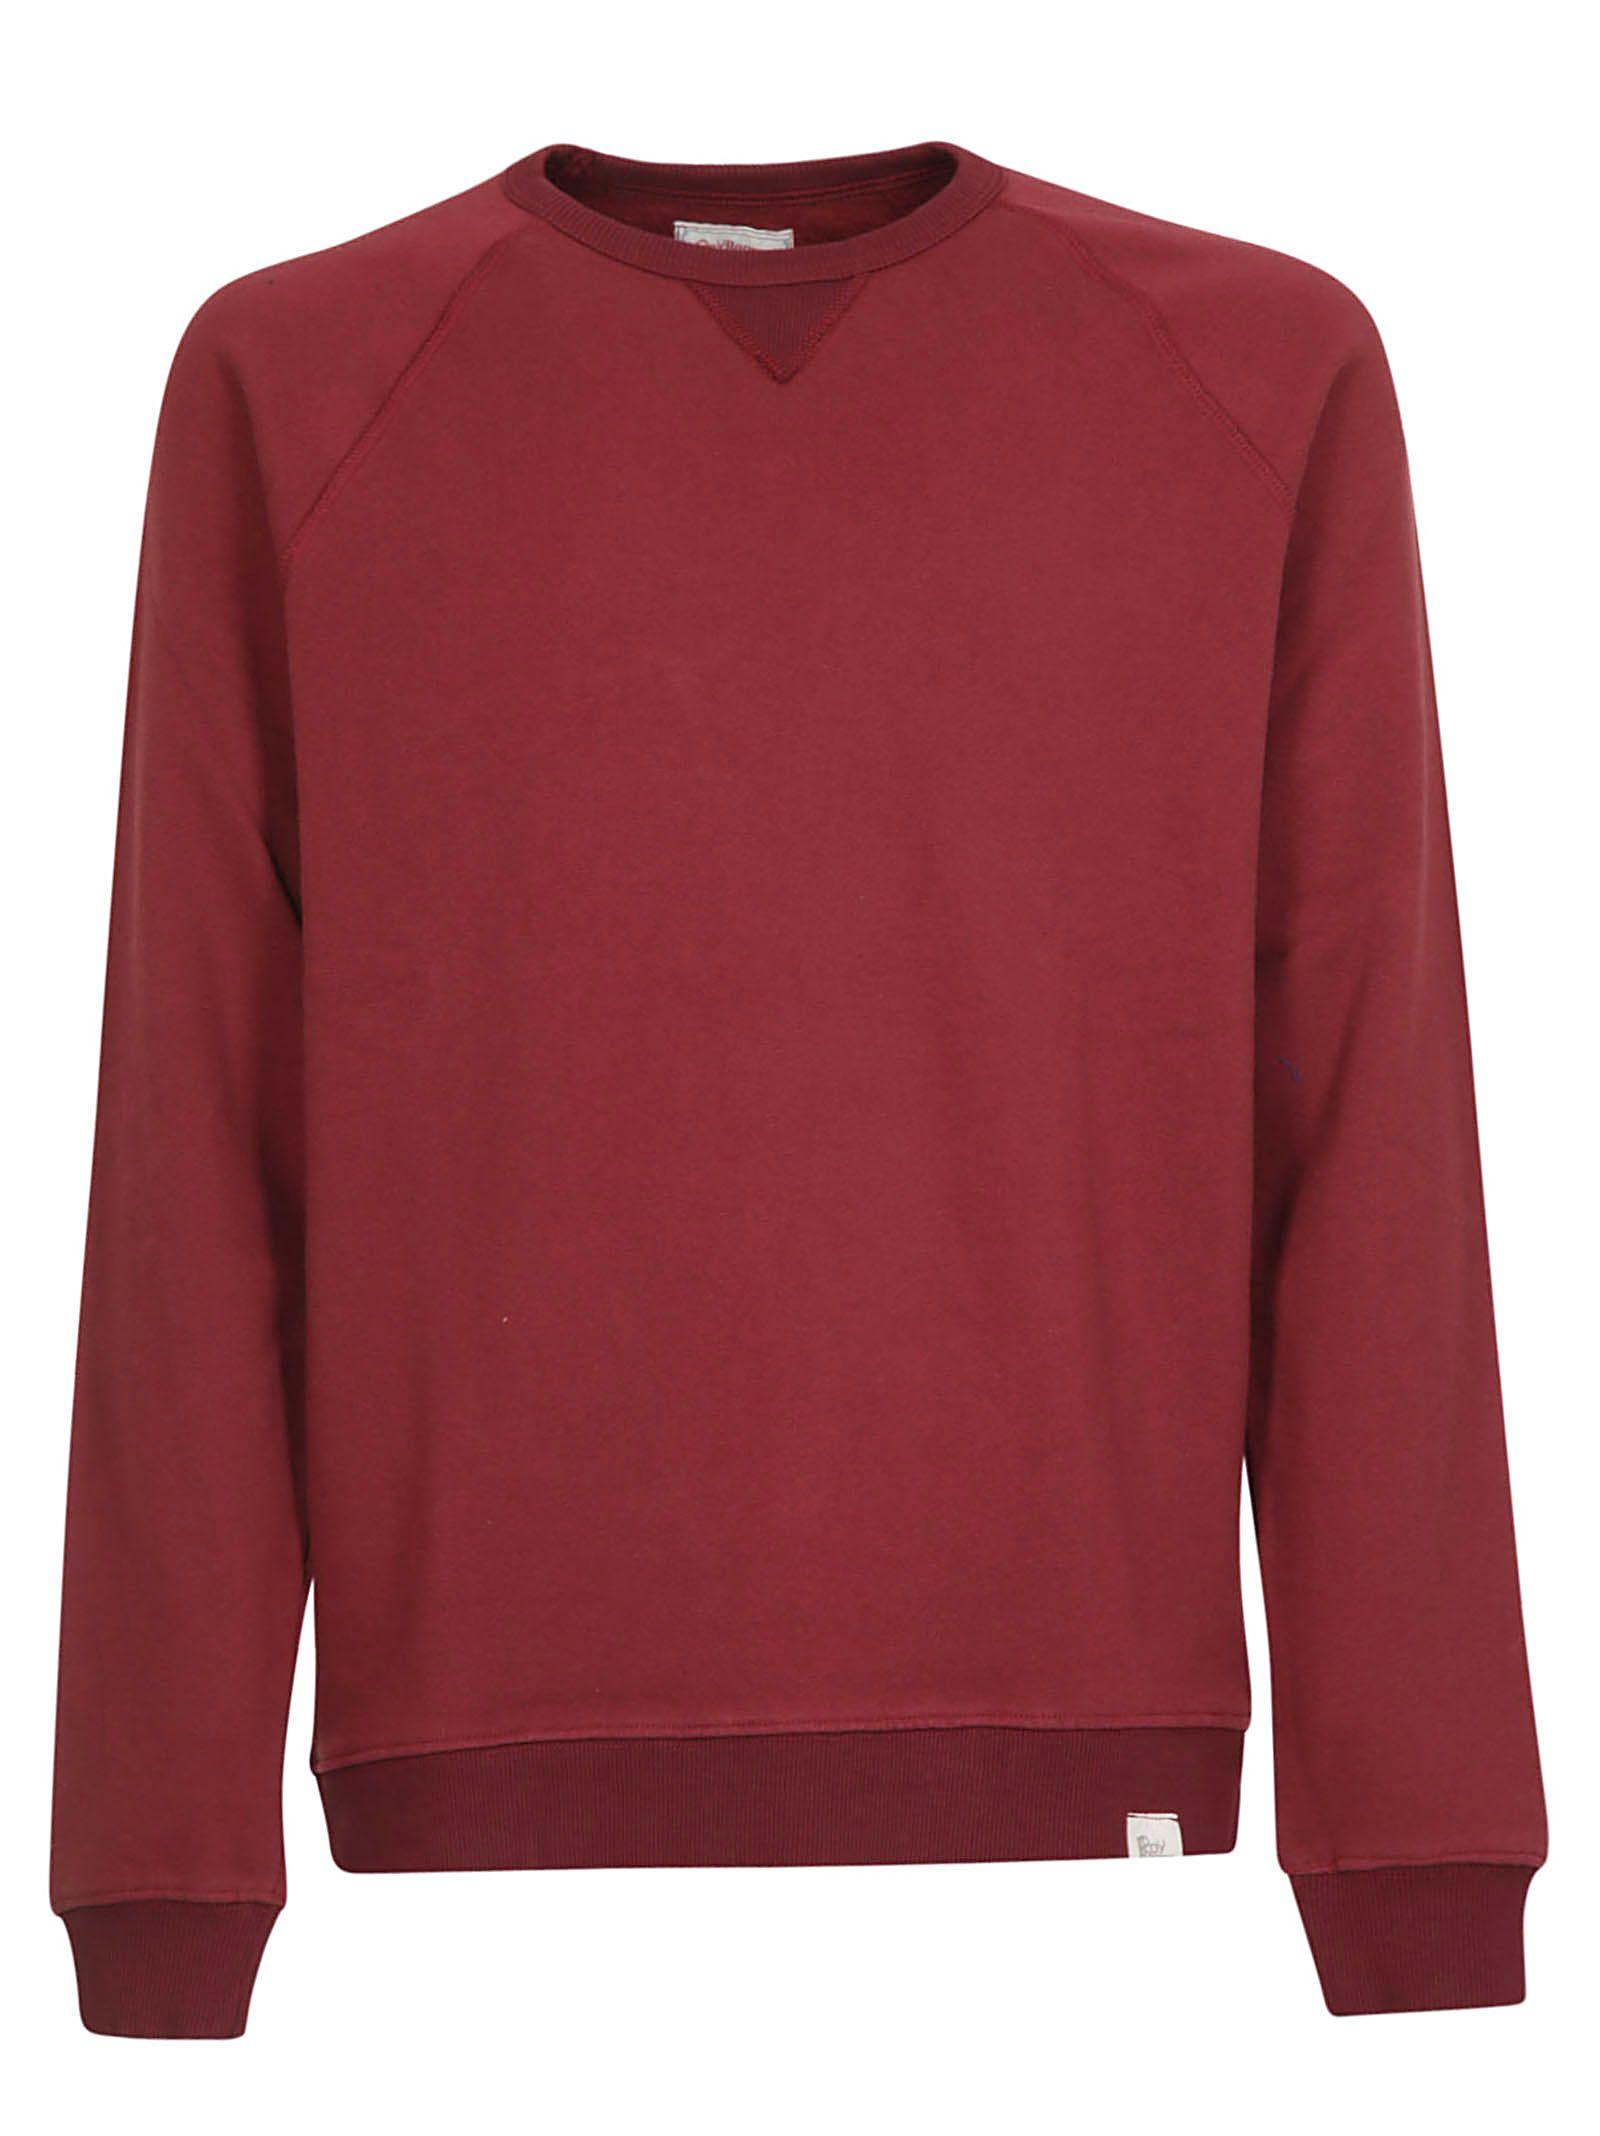 ROY ROGERS Classic Sweatshirt in Bordeaux